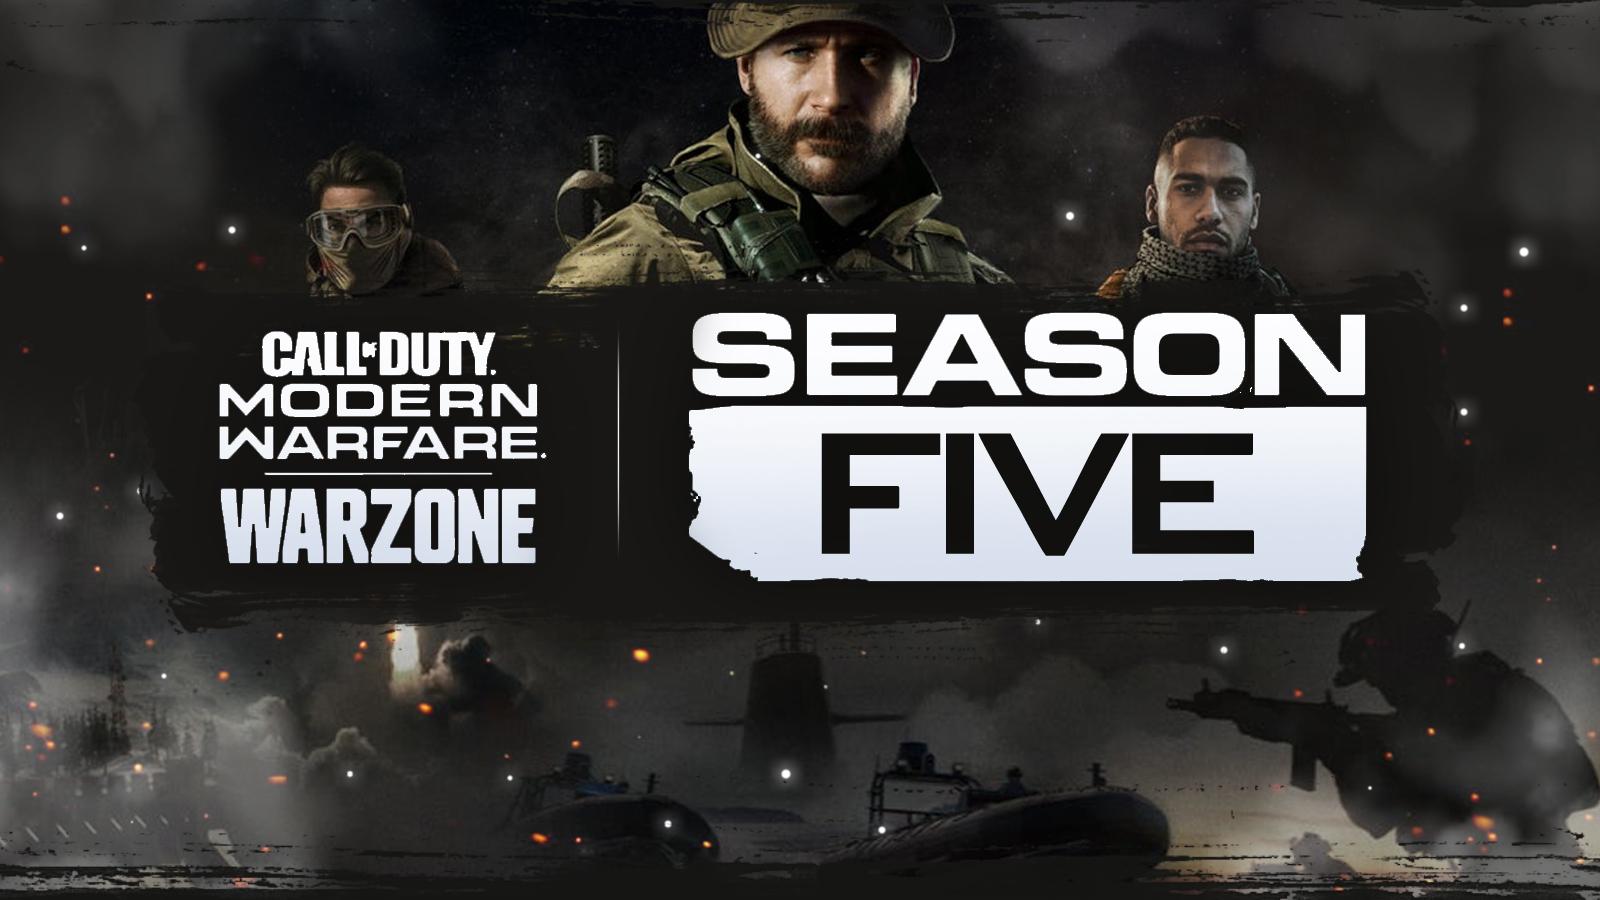 Warzone characters with Season 5 logo